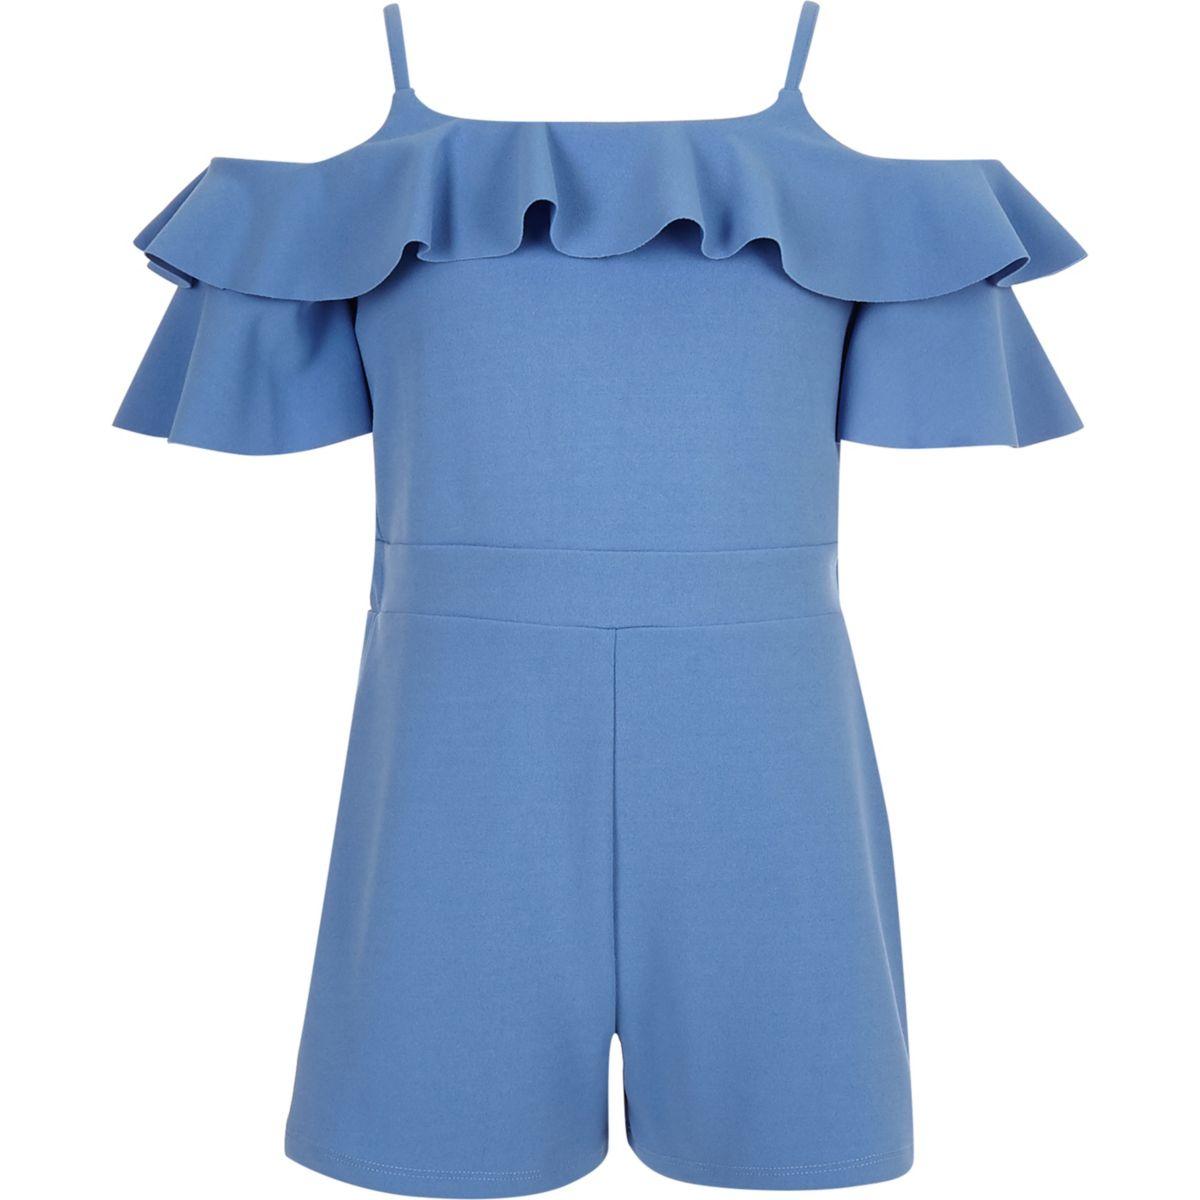 Girls blue cold shoulder ruffle playsuit